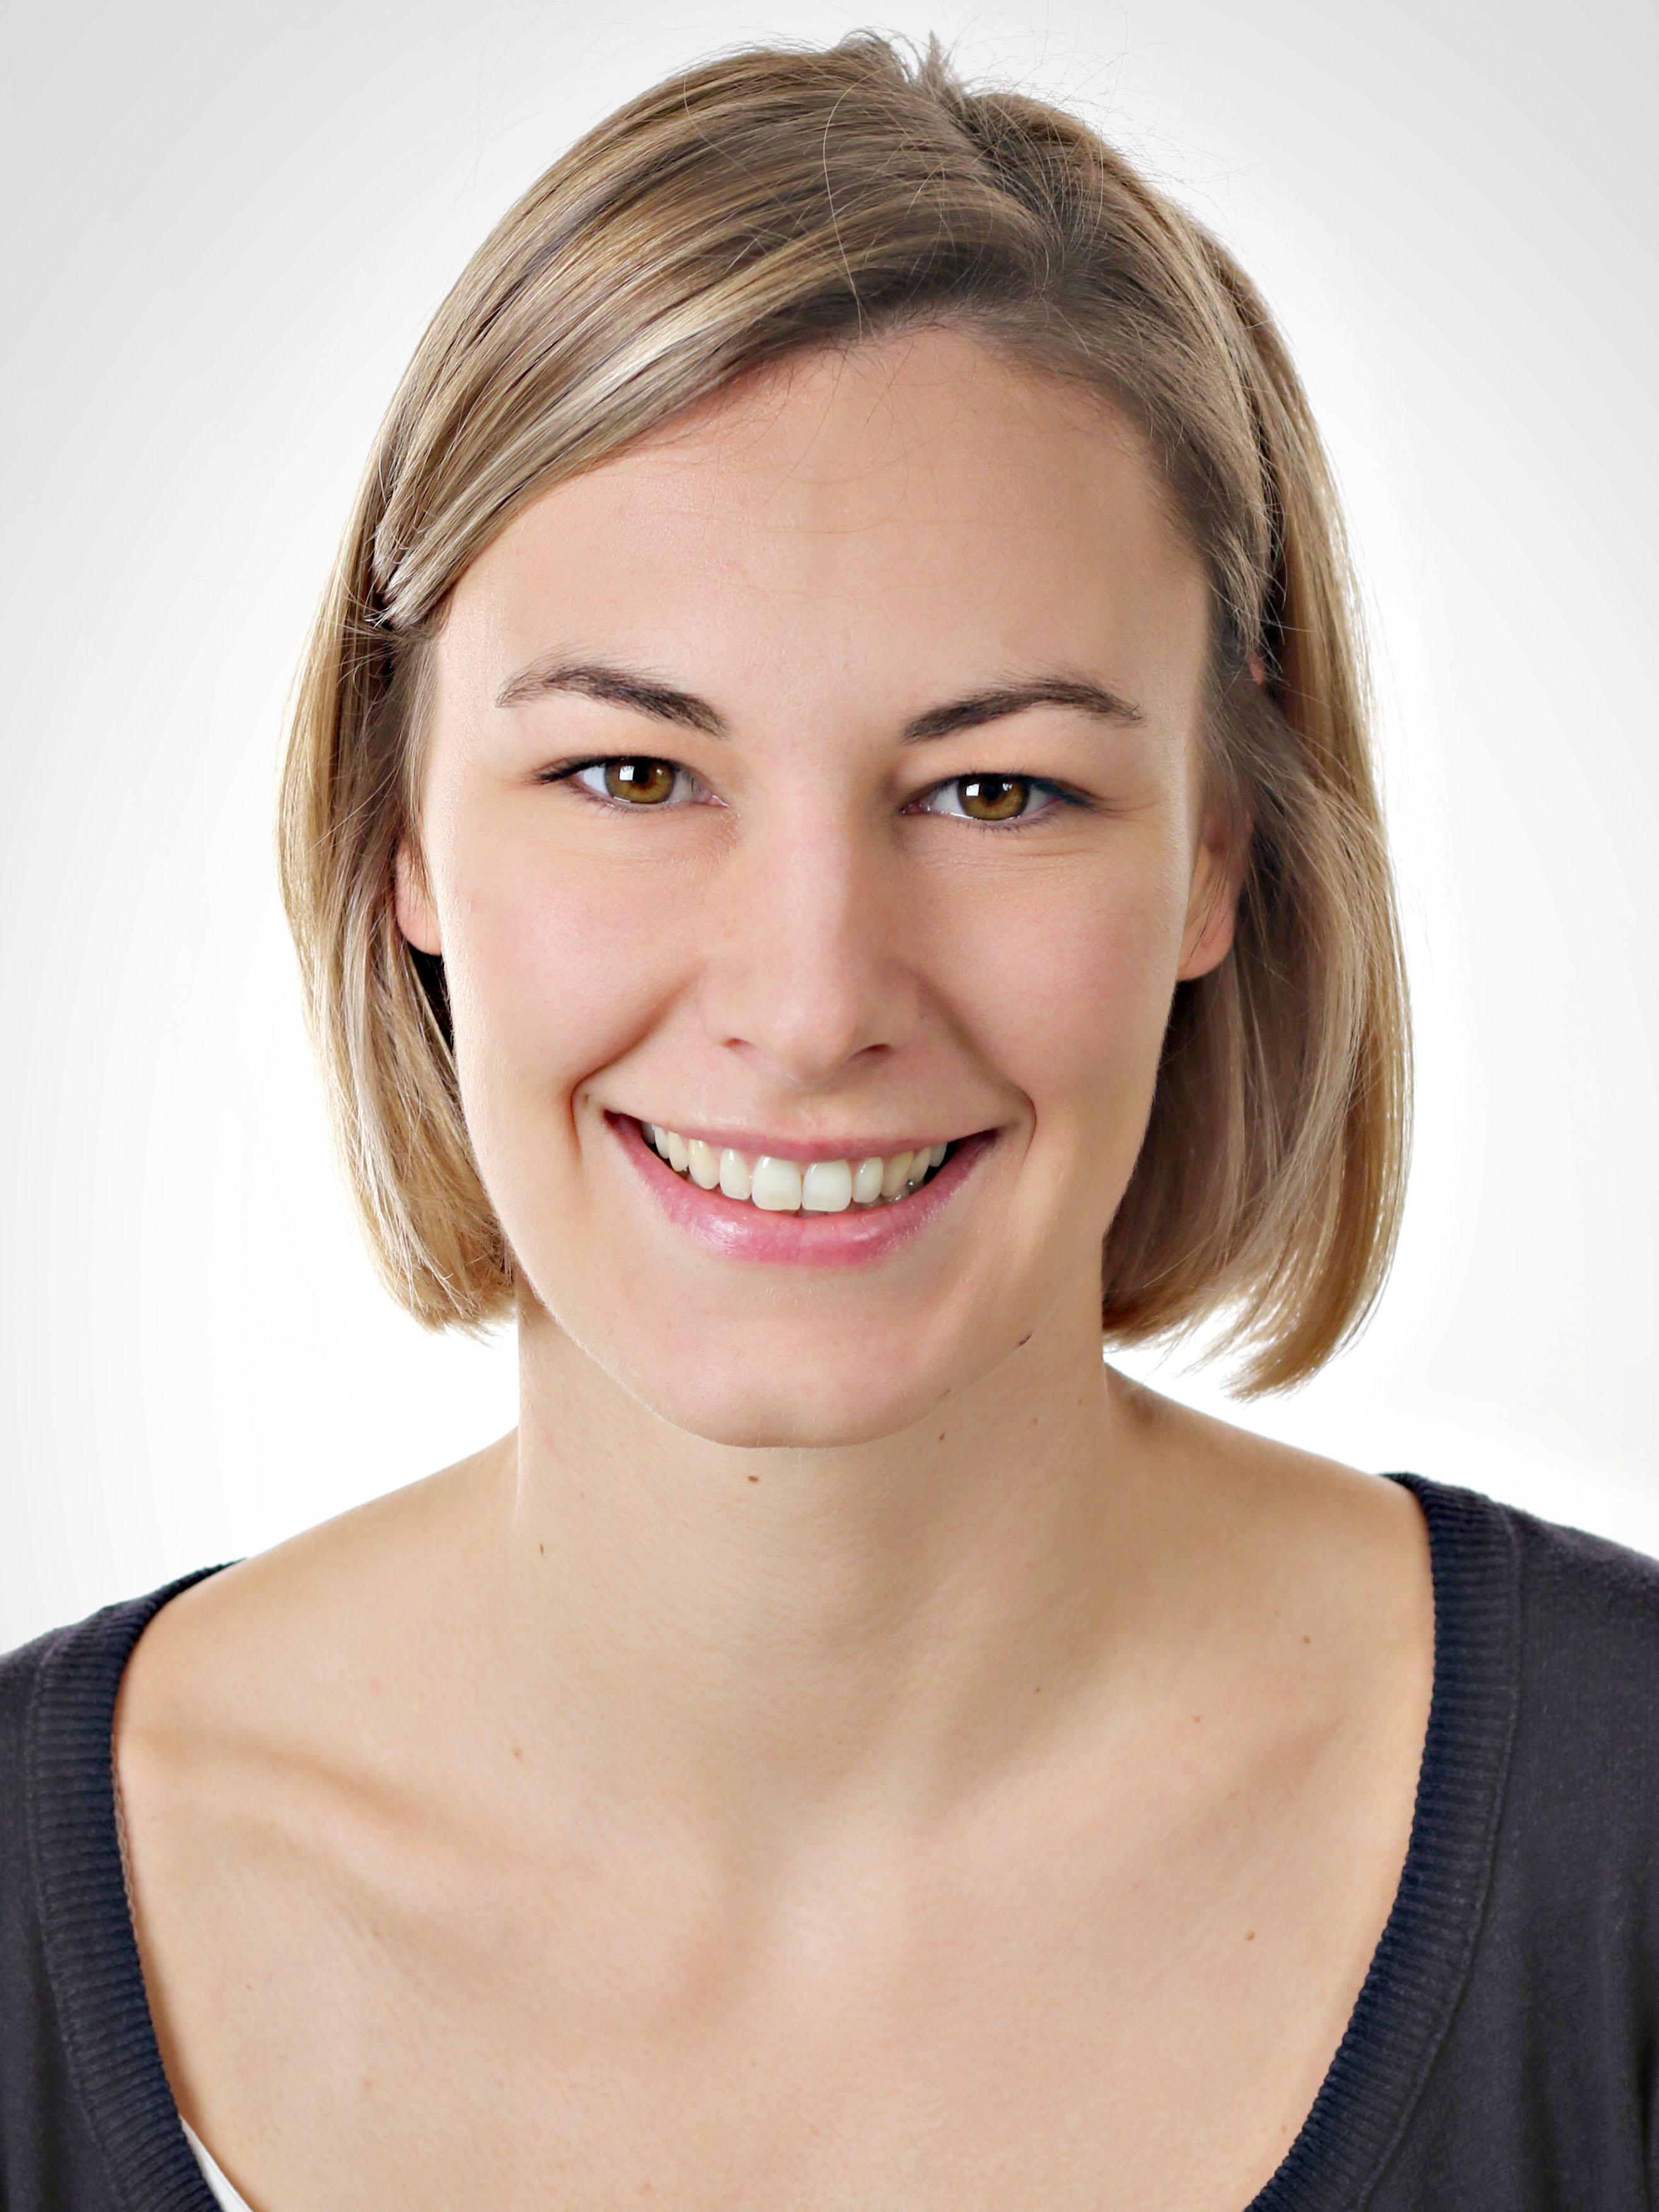 Amy Linker